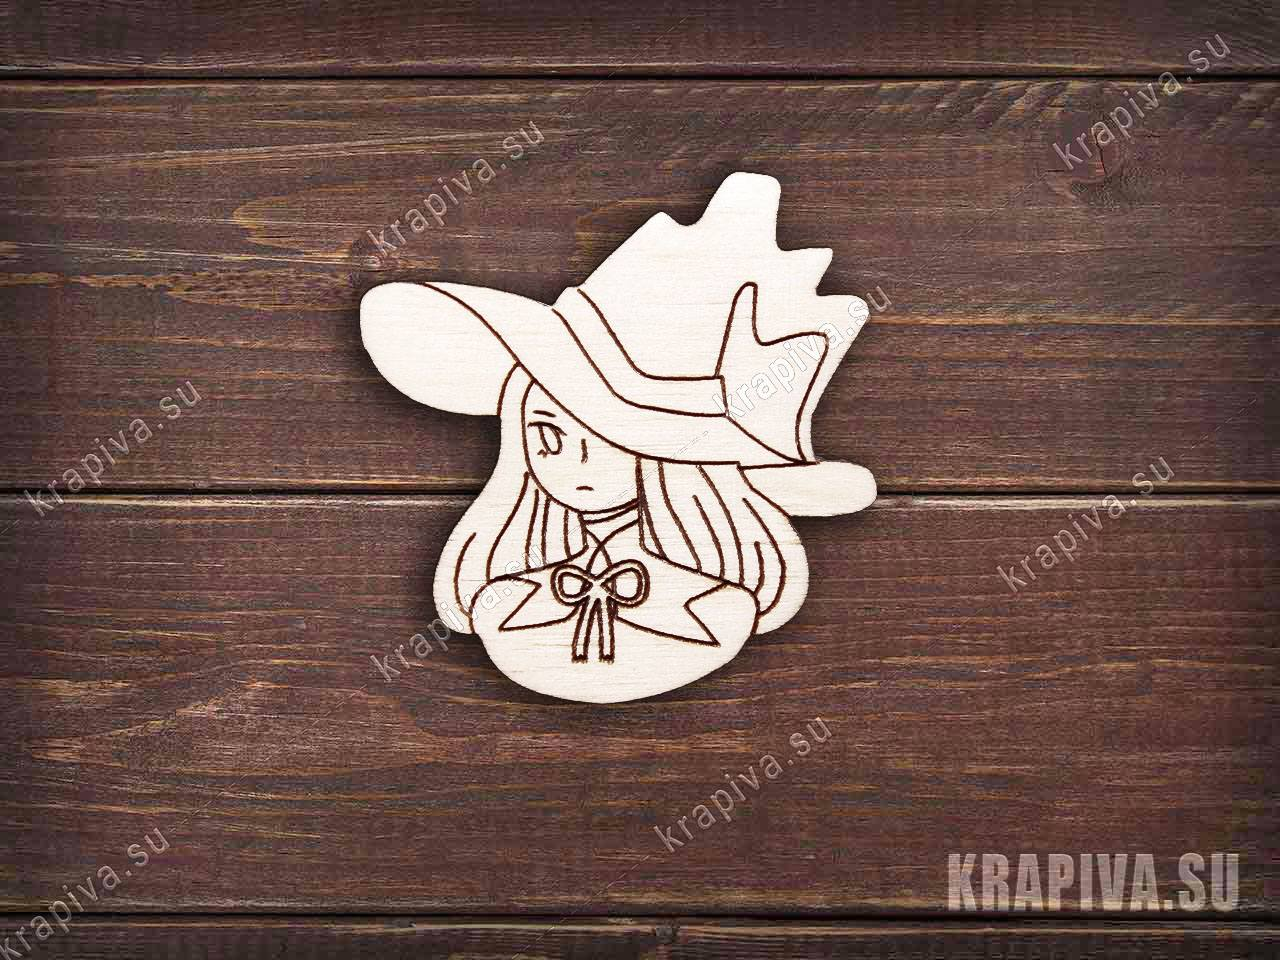 Заготовка значка Магичка (krapiva.su)